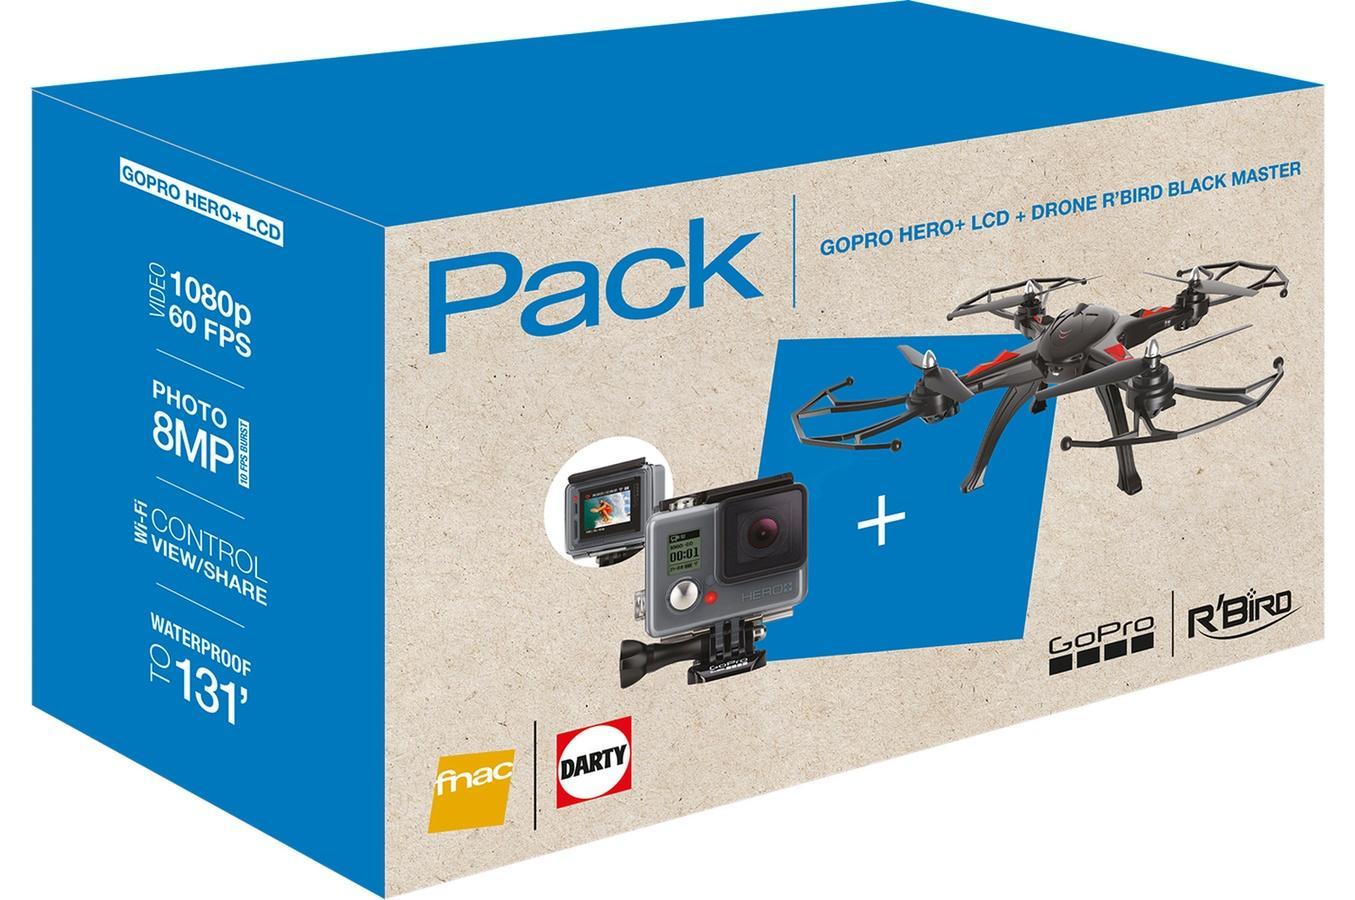 Drone R'Bird DMS240 Black Master + Caméra Gopro Hero+ LCD